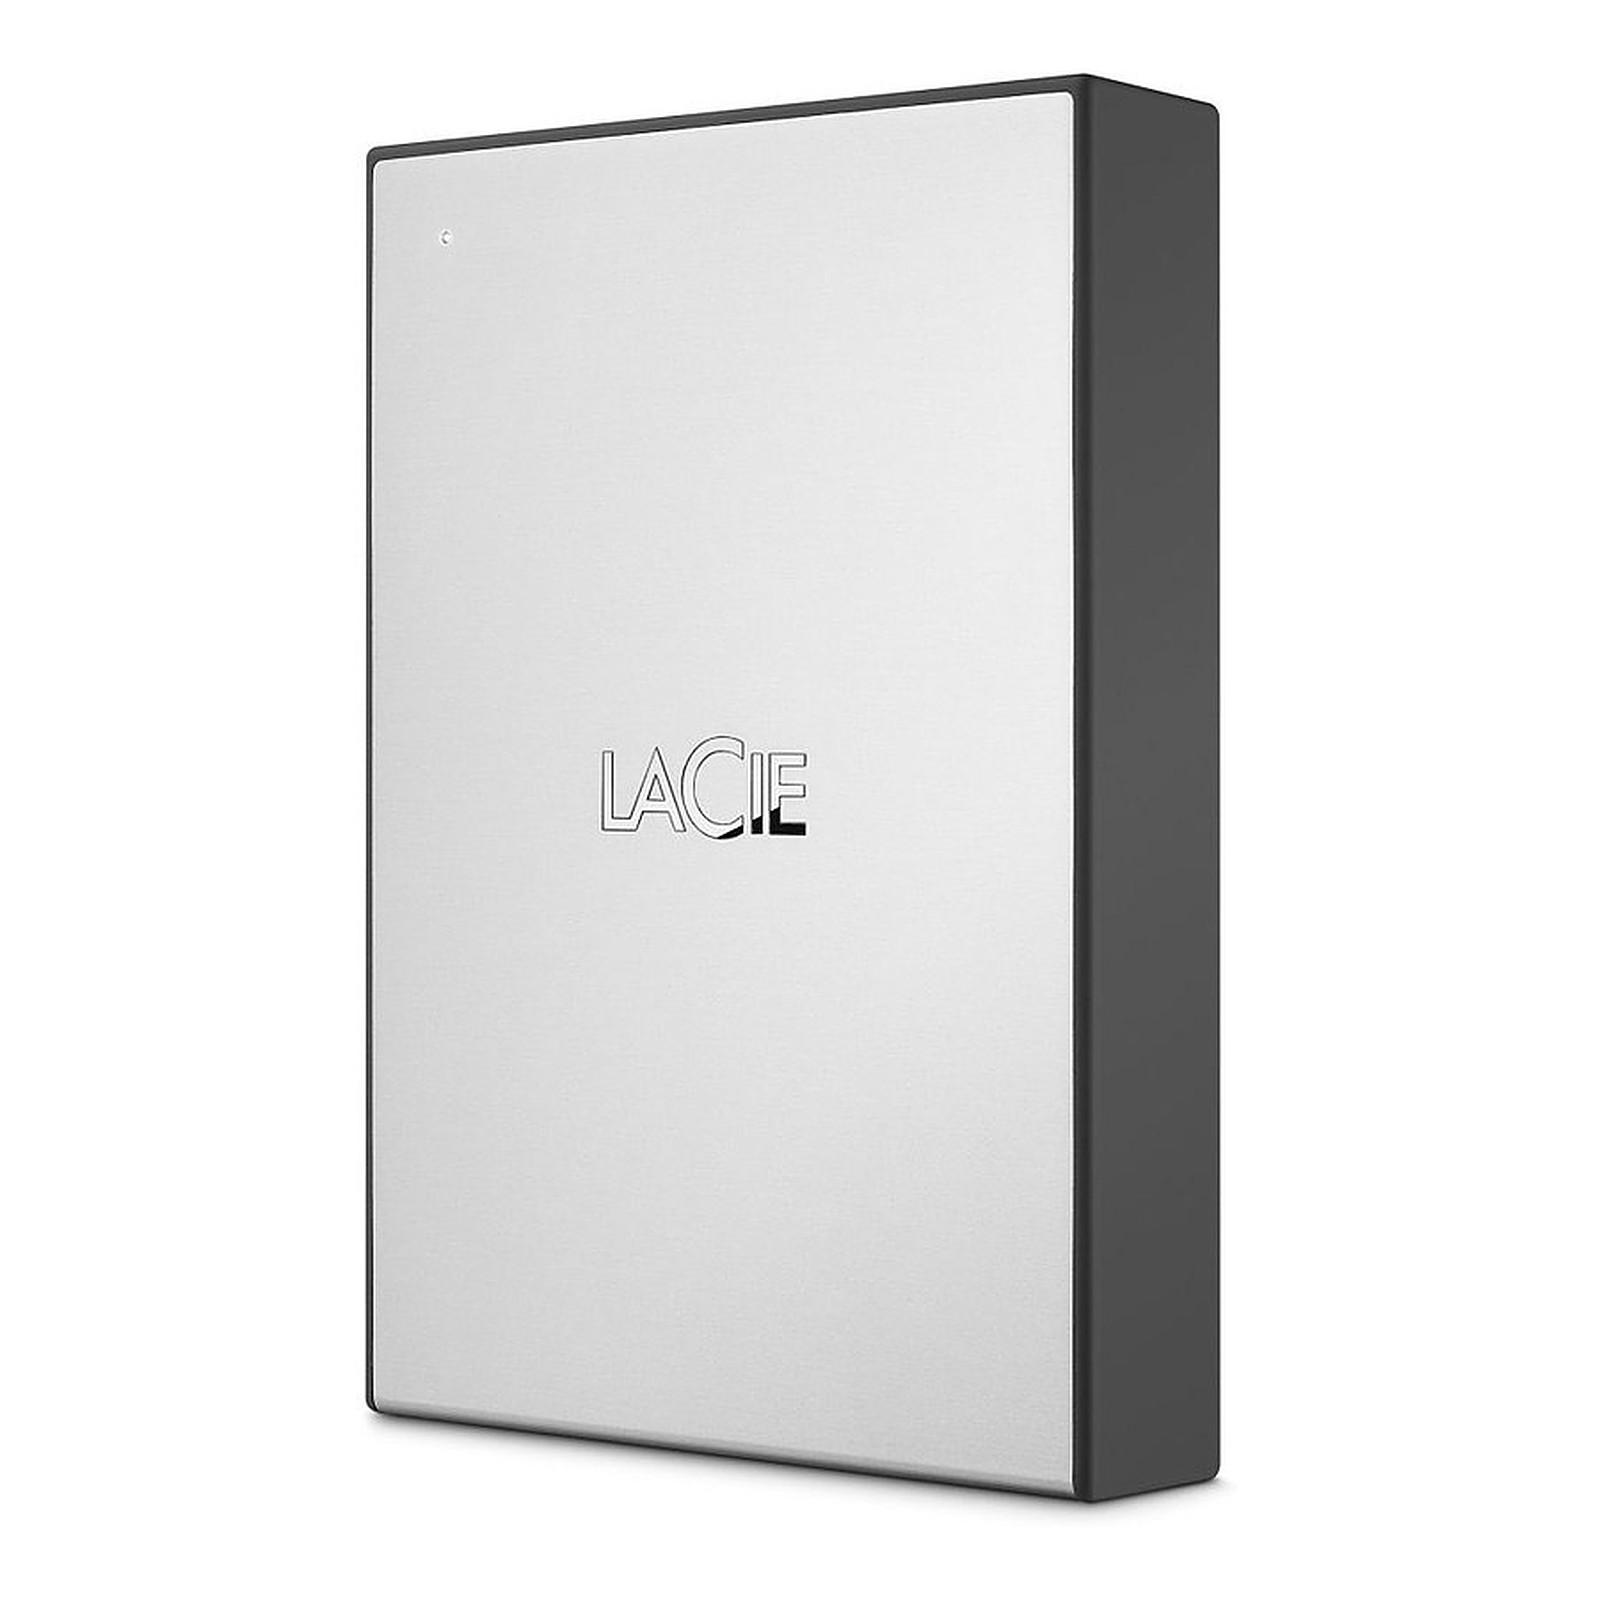 LaCie USB Drive 4 To